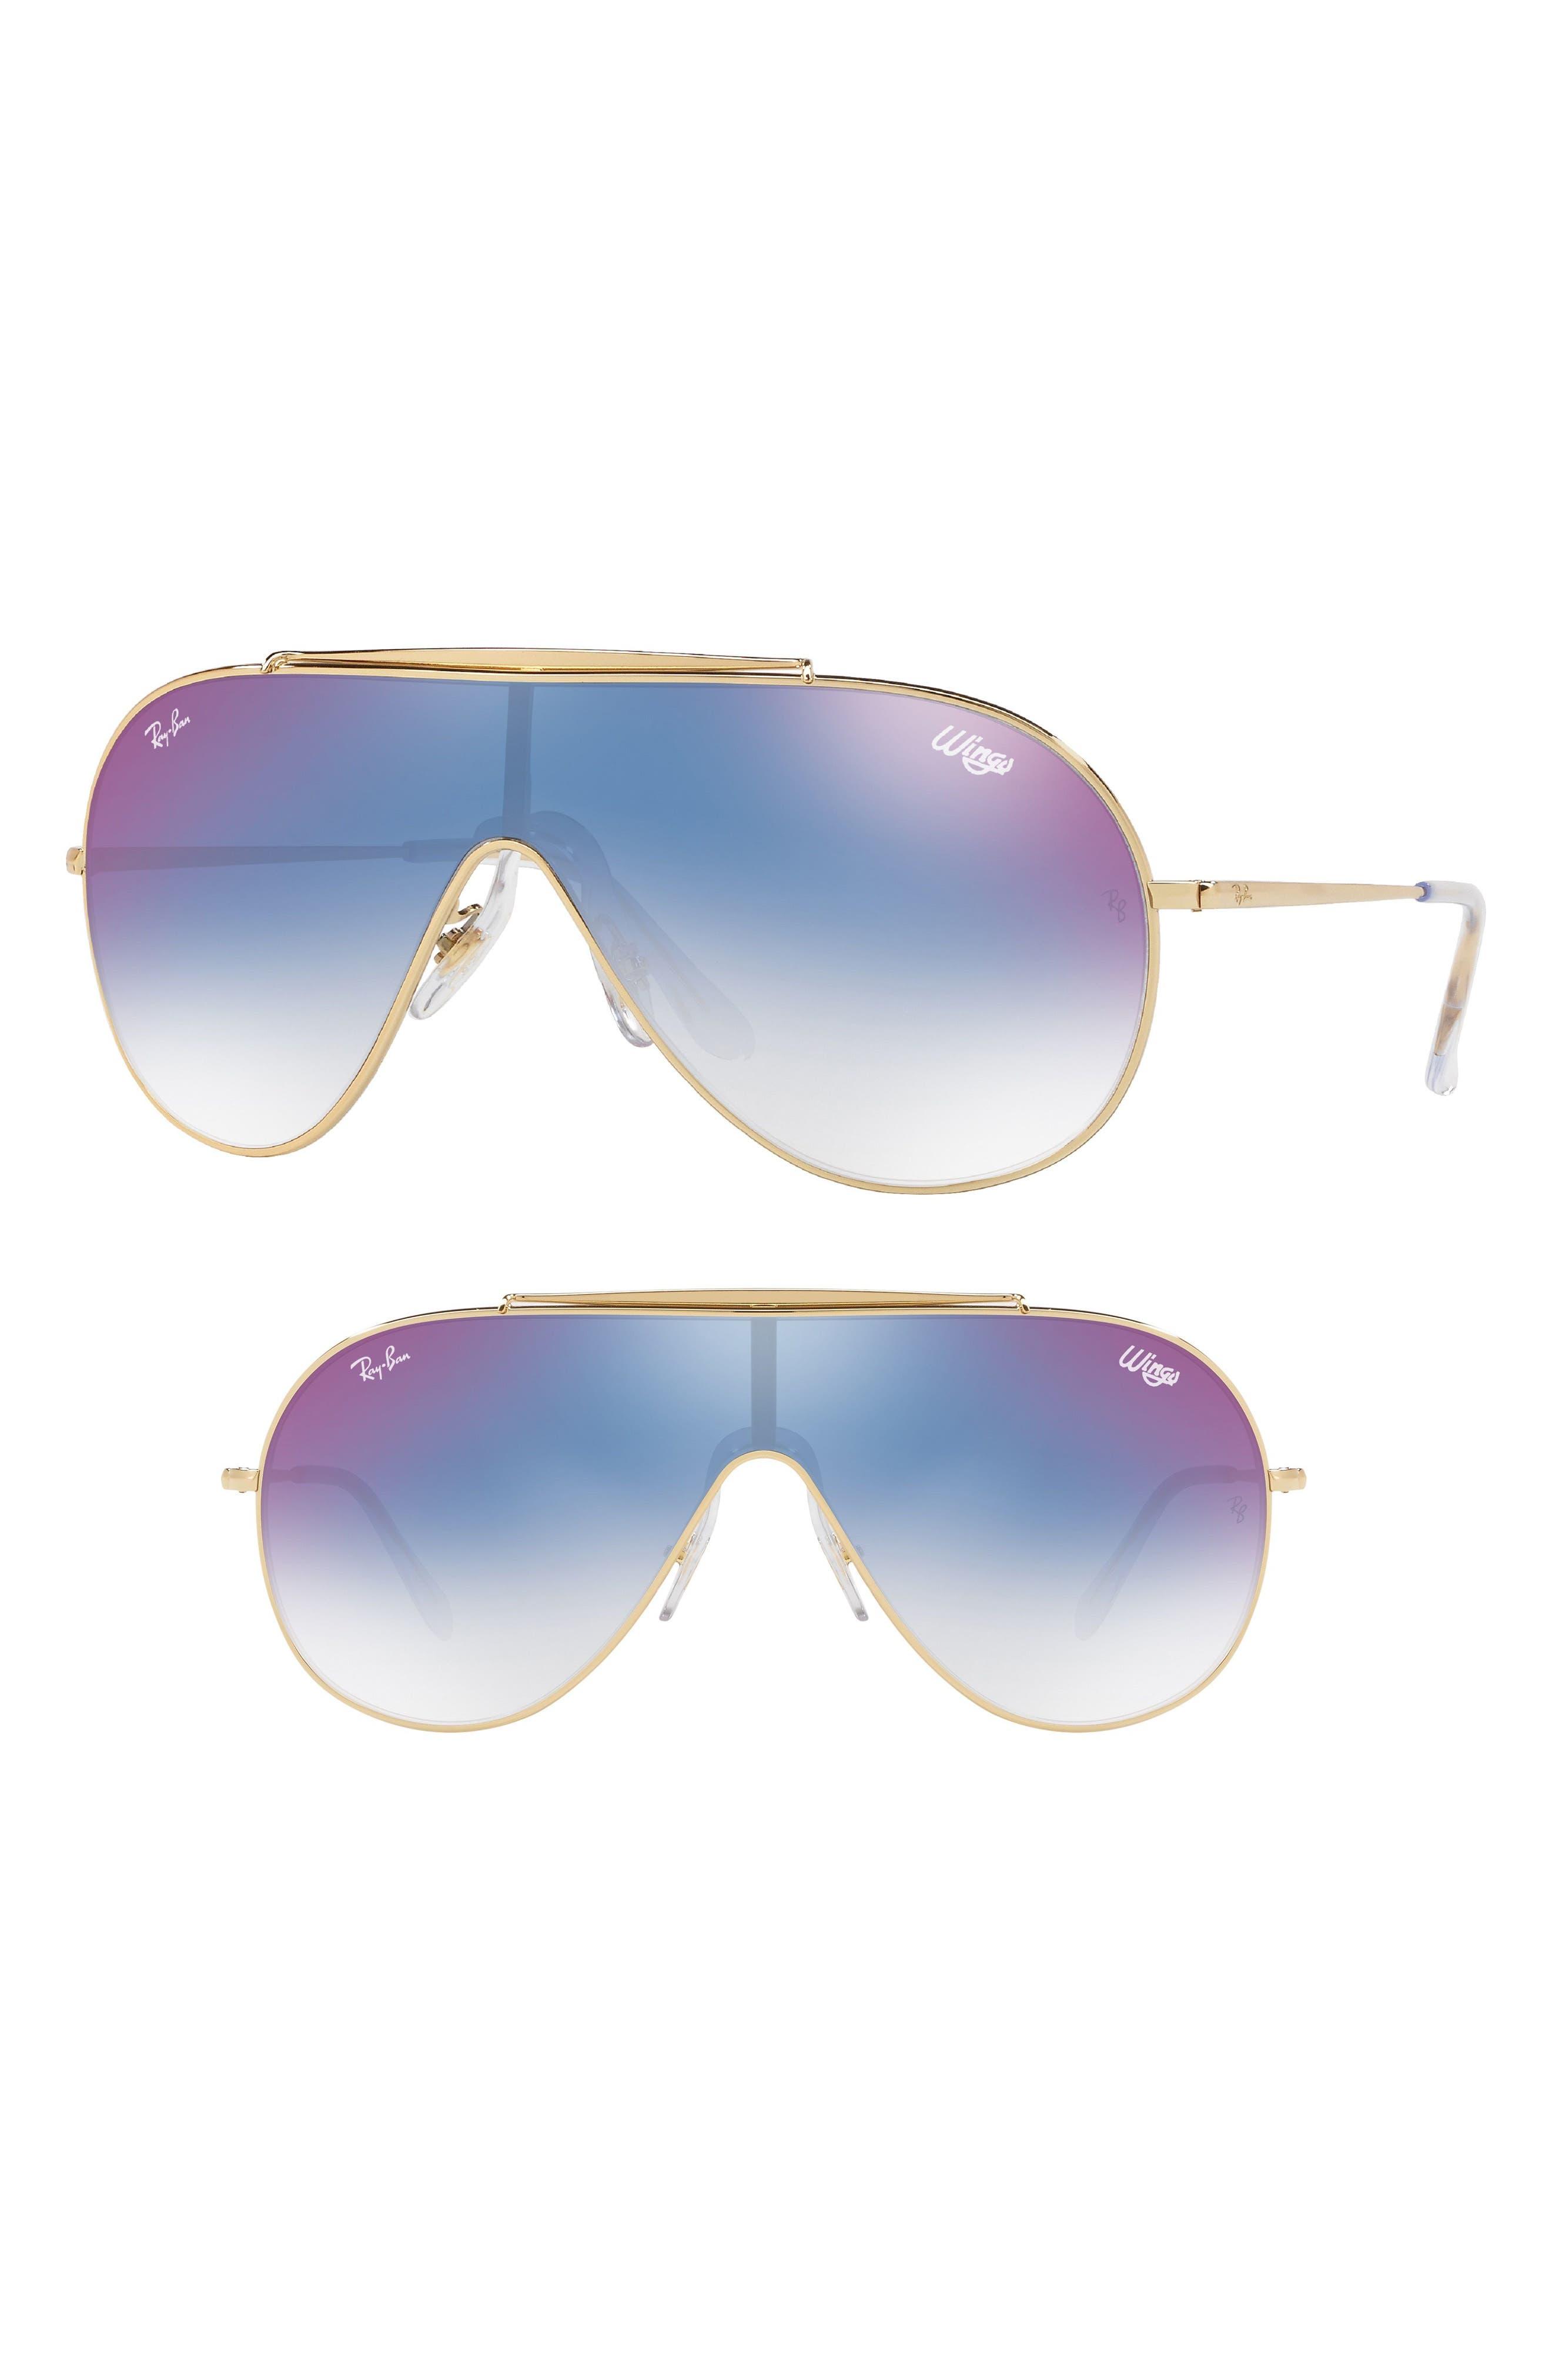 133mm Shield Sunglasses,                             Main thumbnail 1, color,                             Purple/ Blue Gradient Mirror